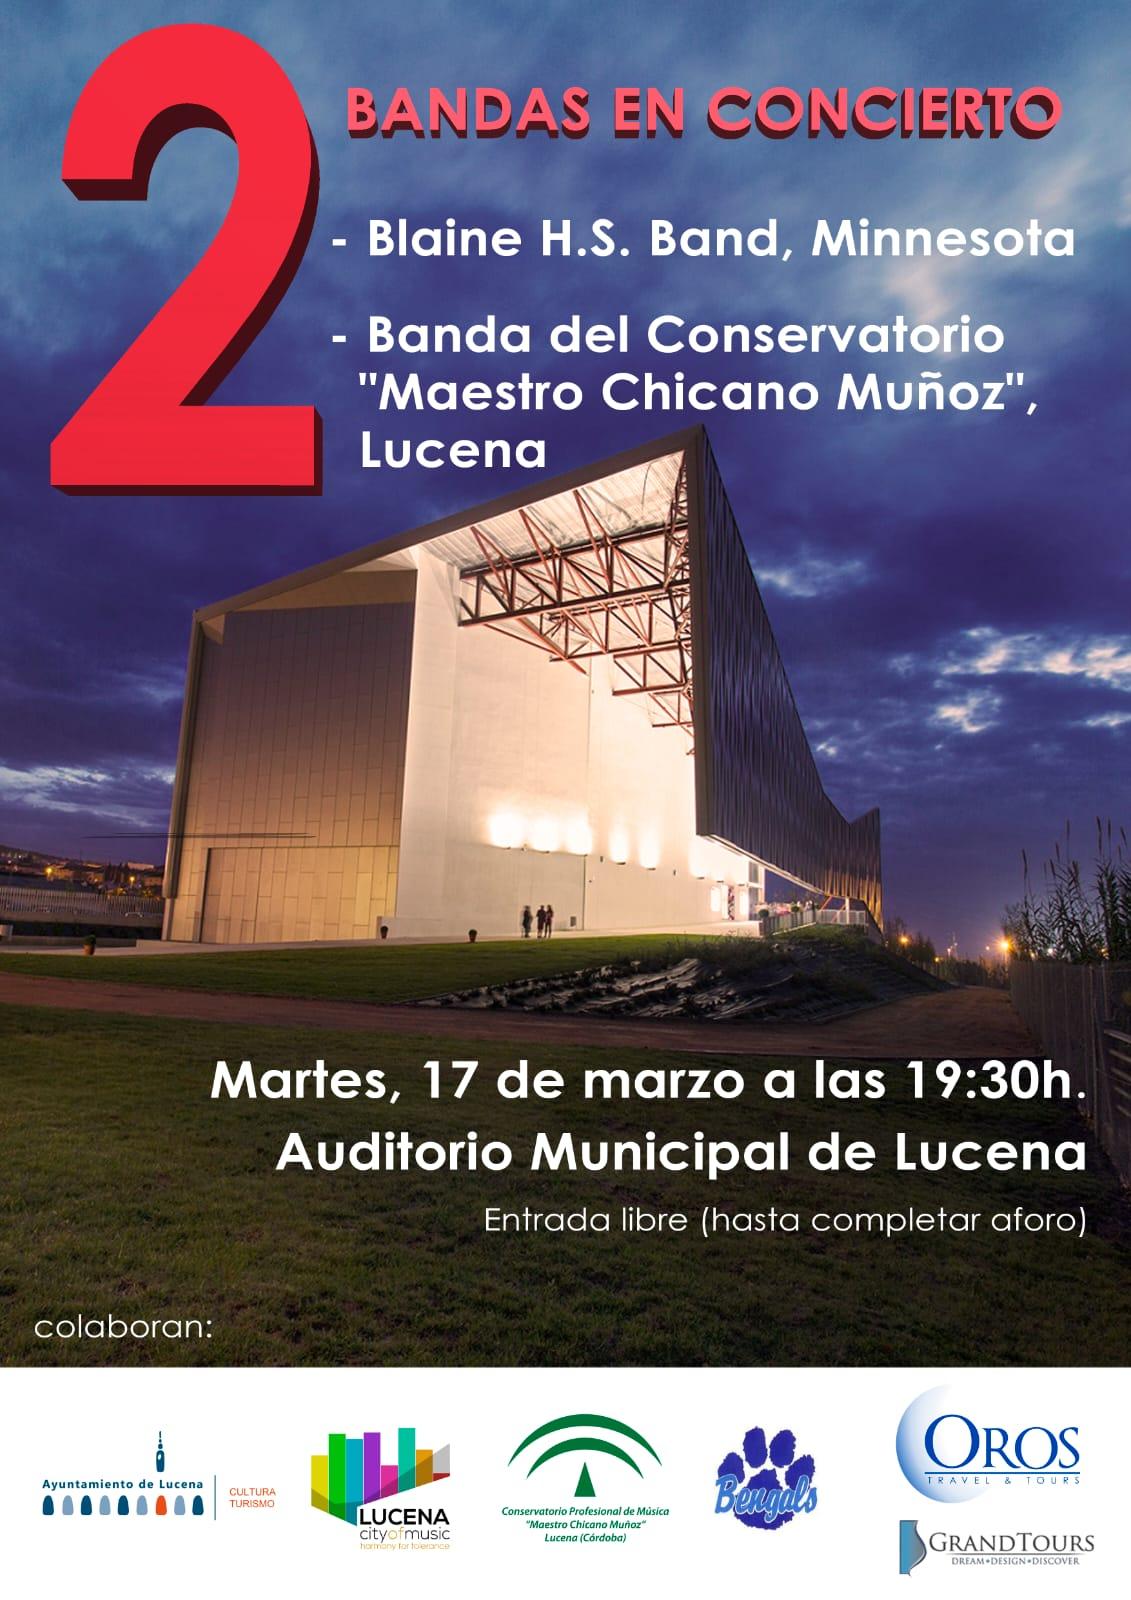 Bandas en concierto @ Auditorio Municipal